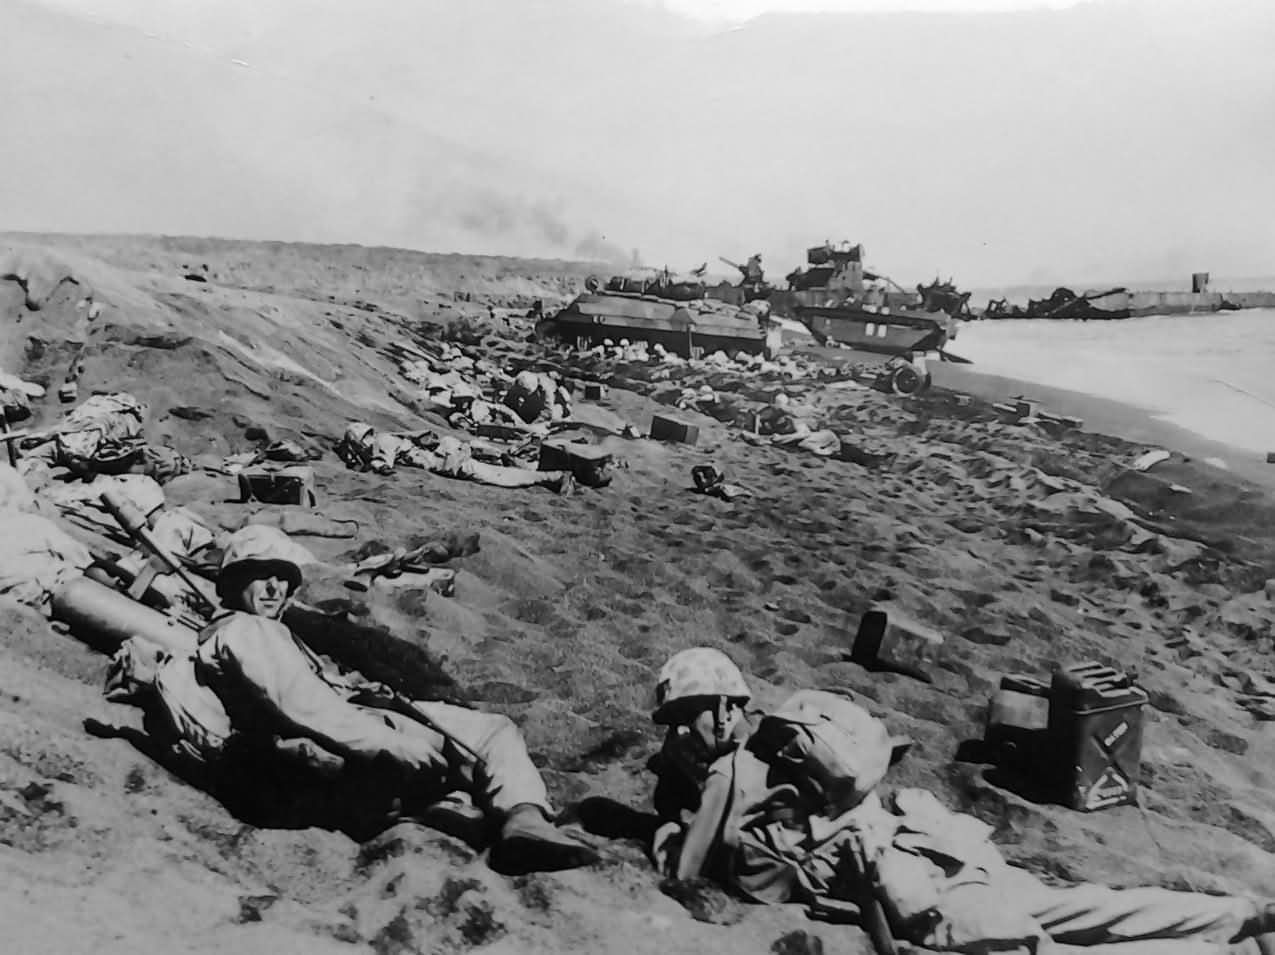 4th Division Marines Iwo Jima beachhead   Iwo Jima ...  Usmc